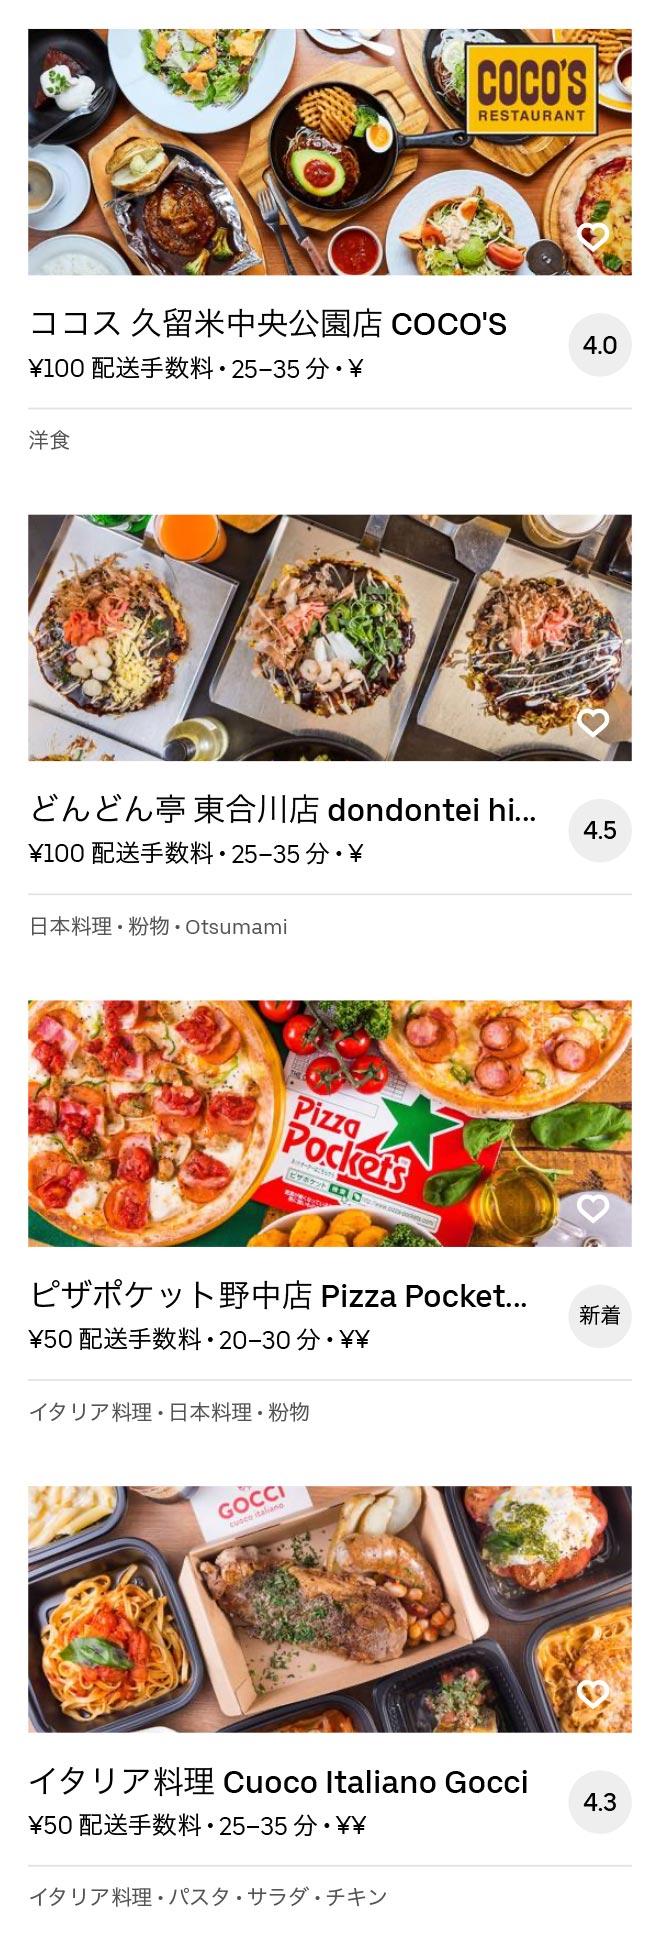 Kurume daigakumae menu 2008 07